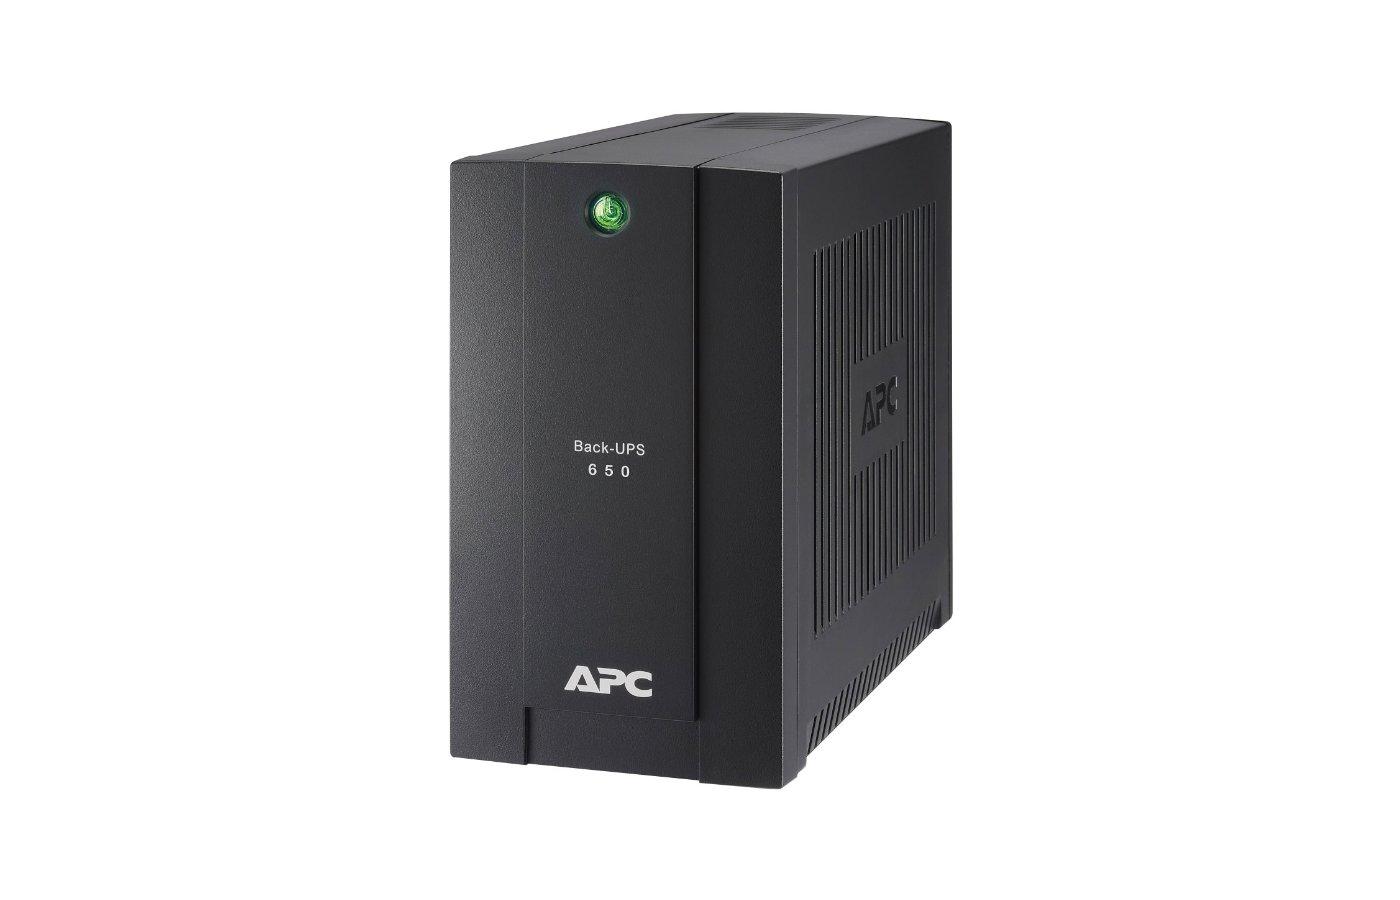 Блок питания APC Back-UPS BC650-RSX761 360Вт 650ВА черный